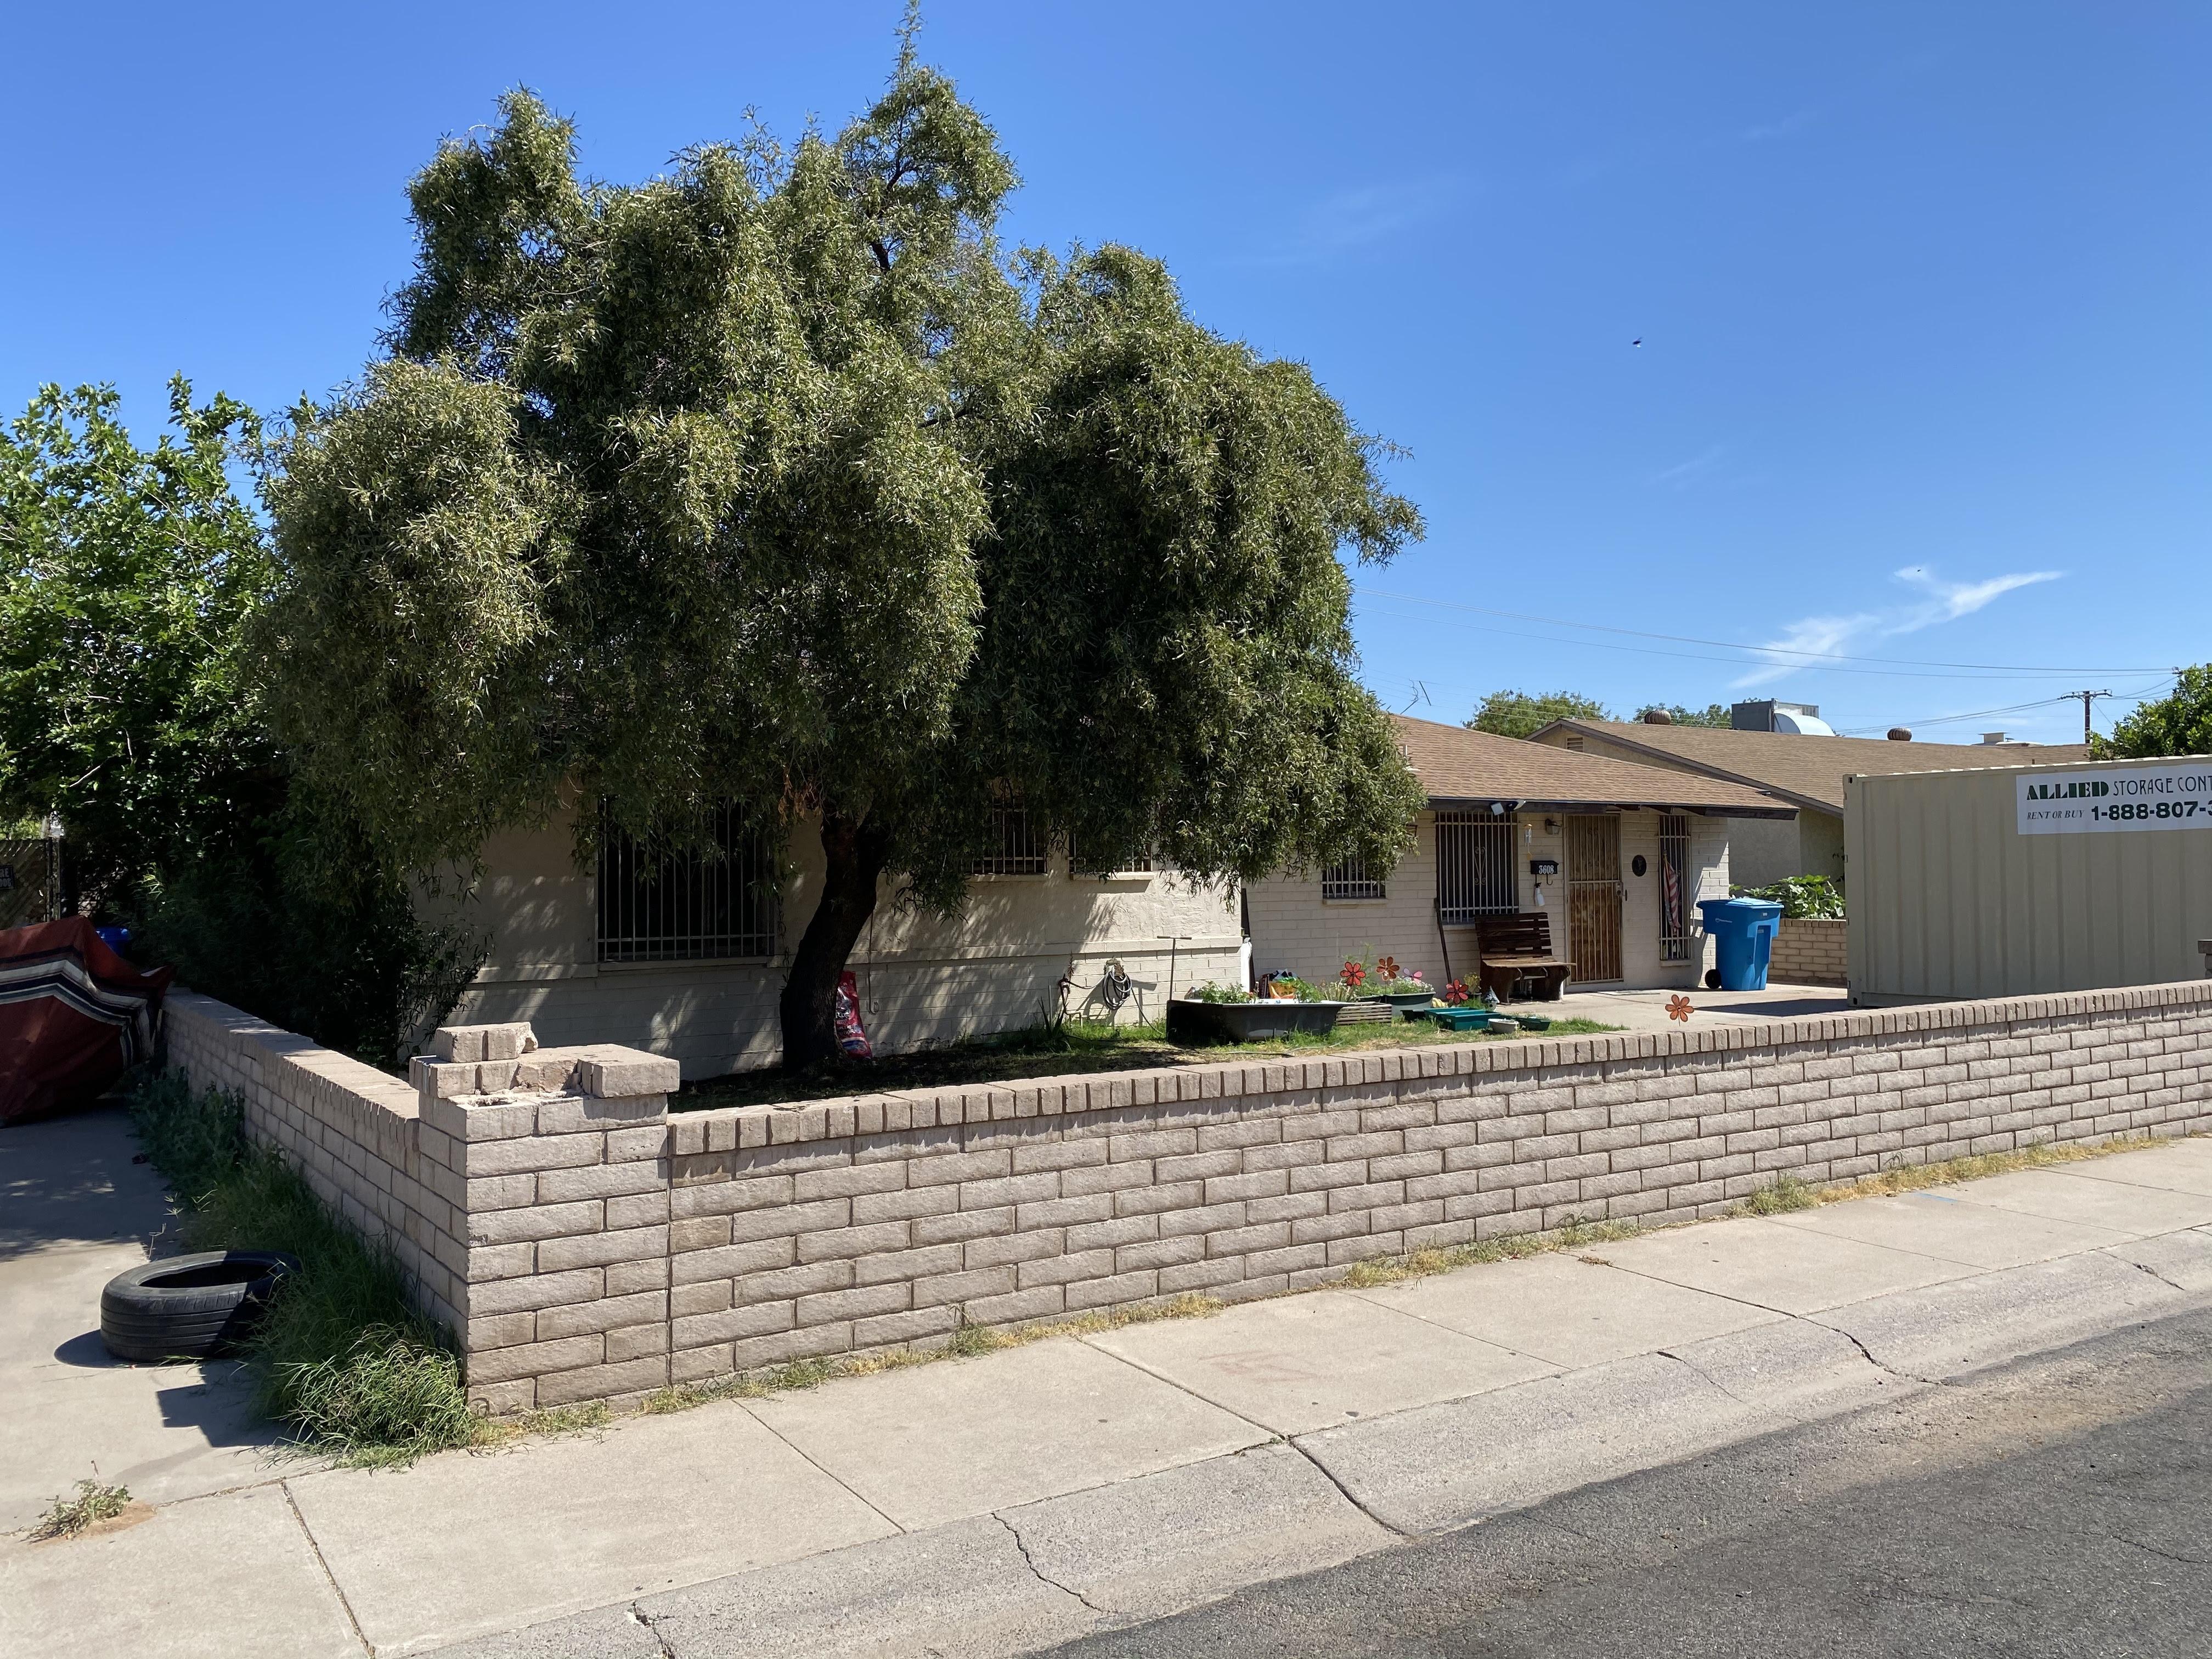 3608 W Marshall Ave Phoenix, AZ 85019 wholesale house listing near GCU